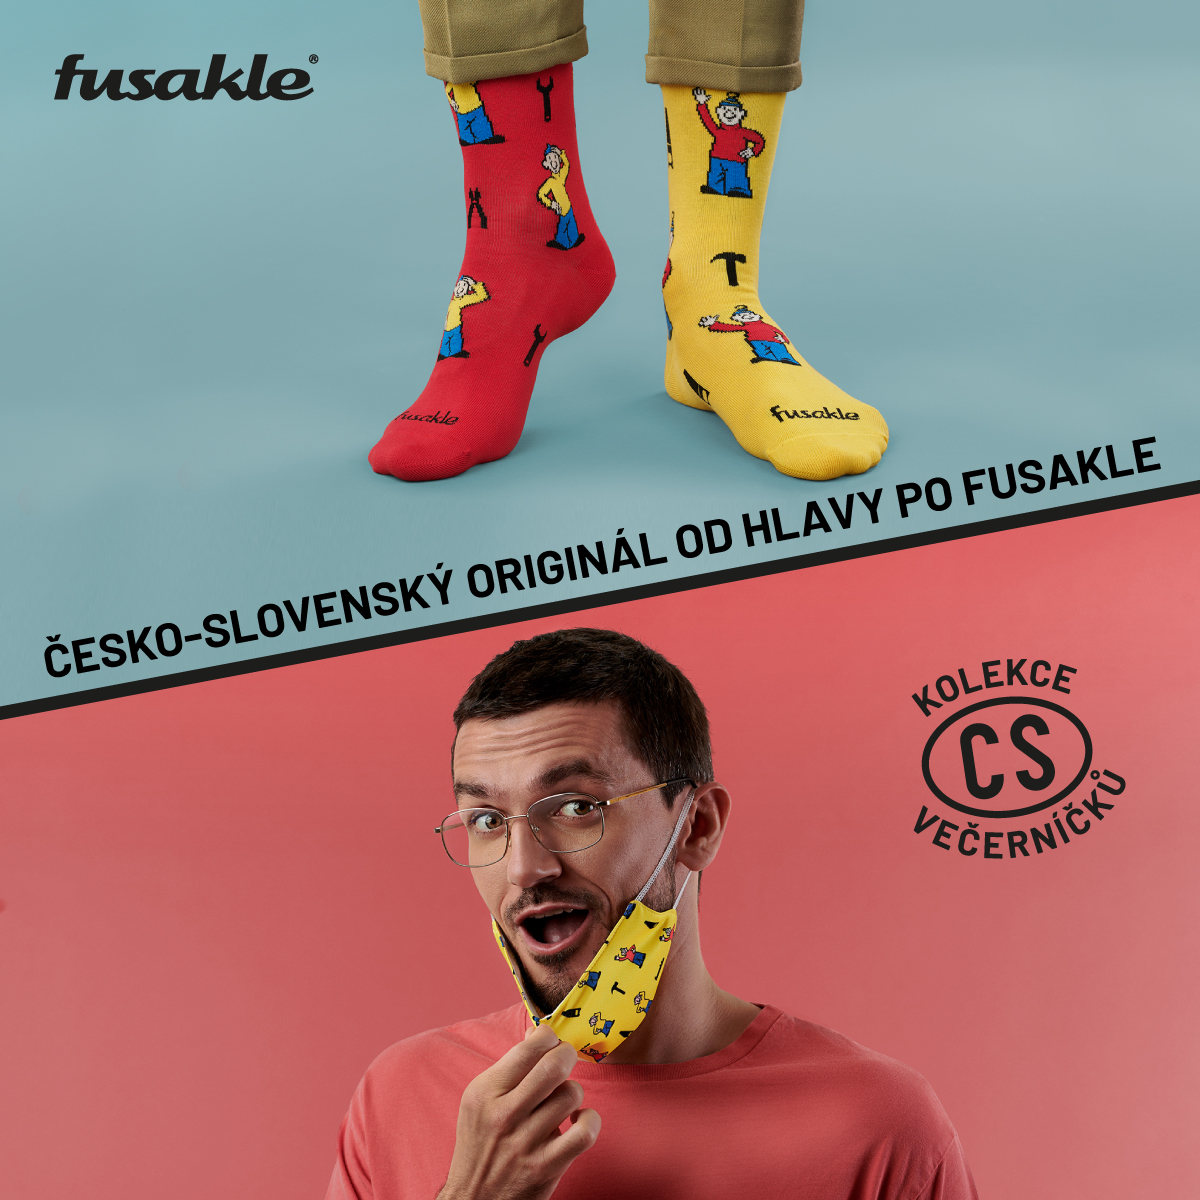 FSKL_CS-vecernickyCZ-02_FB_1200x1200